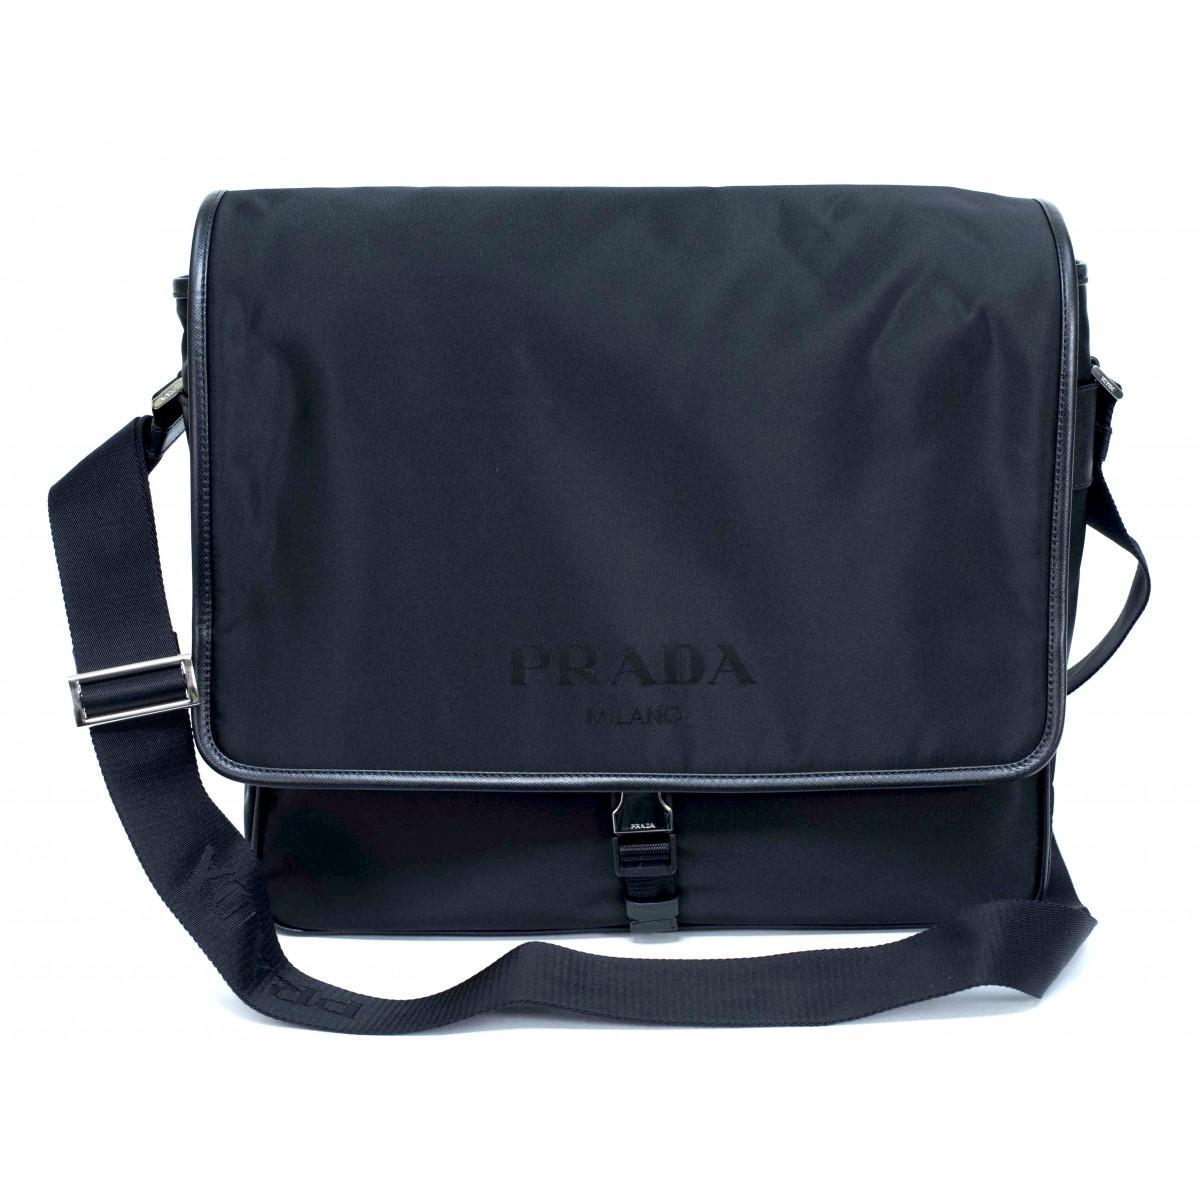 81ed22078ec2 ... canada prada bag v158 064 f0002 nylon black f4bbb 6e5f5